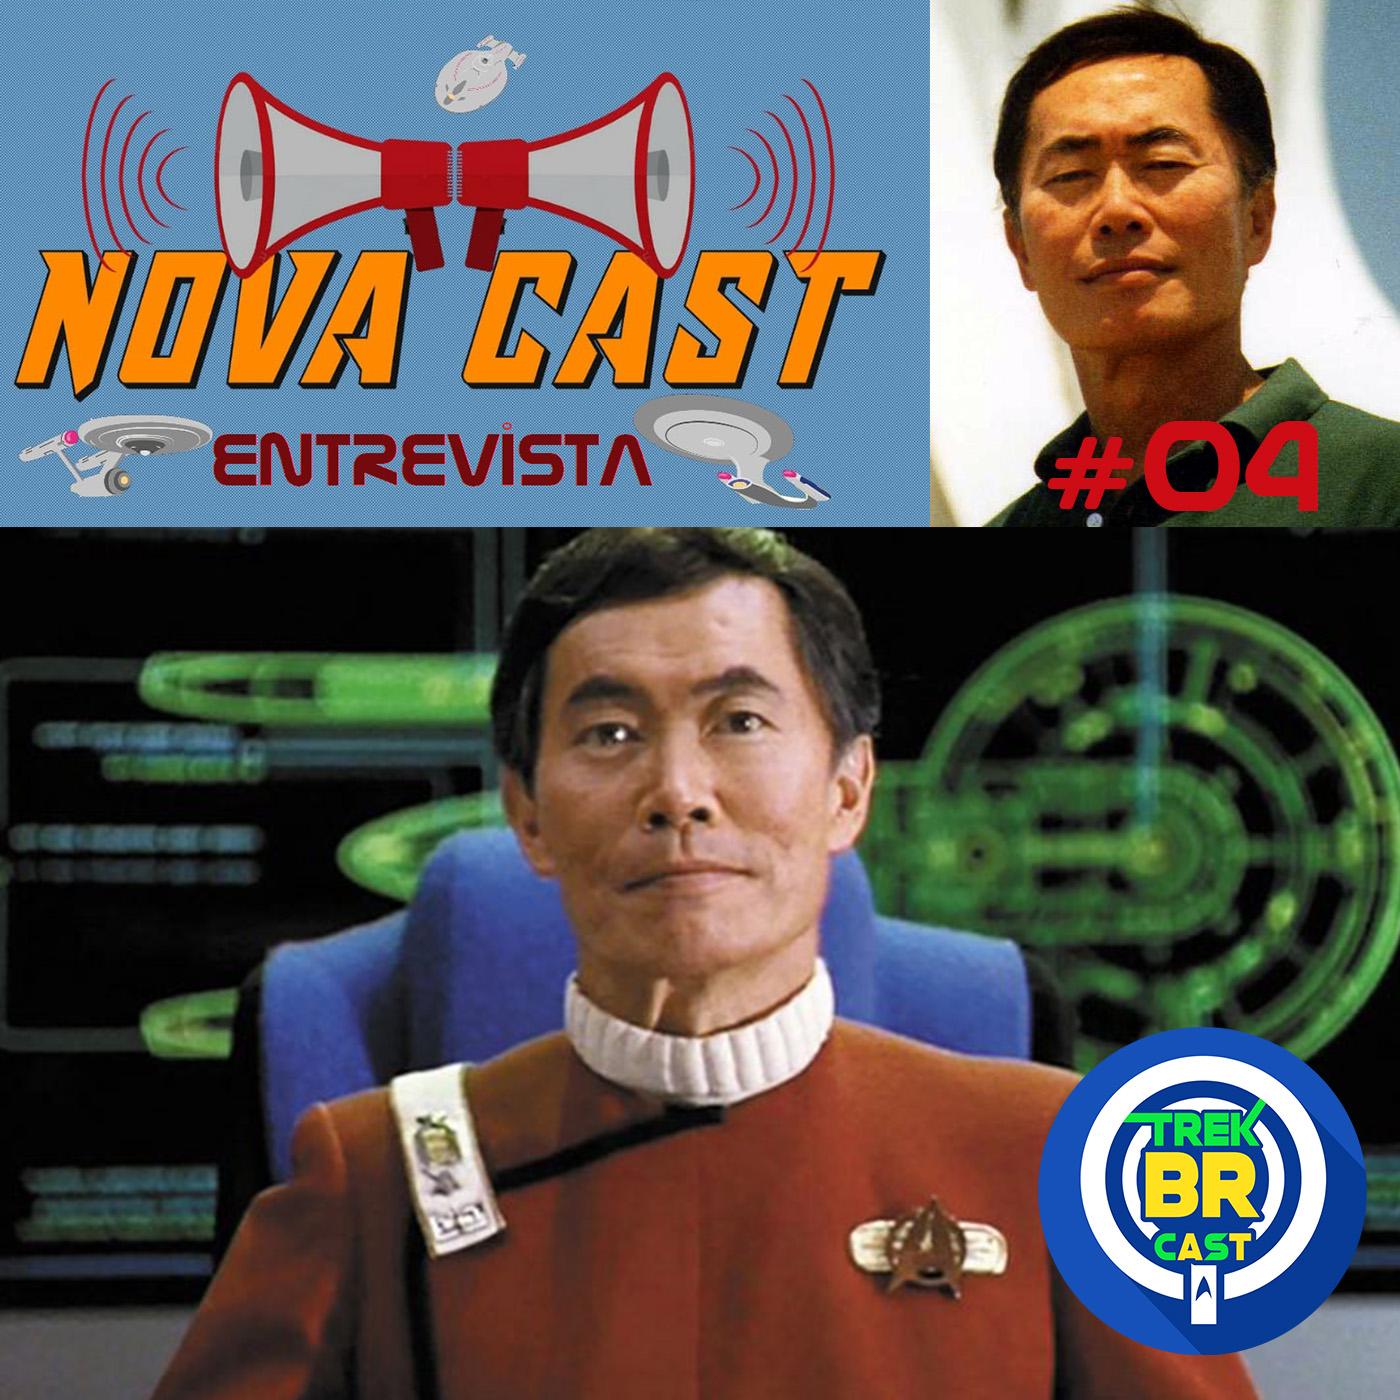 Geroge Takei (Sulu) - NovaCast Entrevista 4